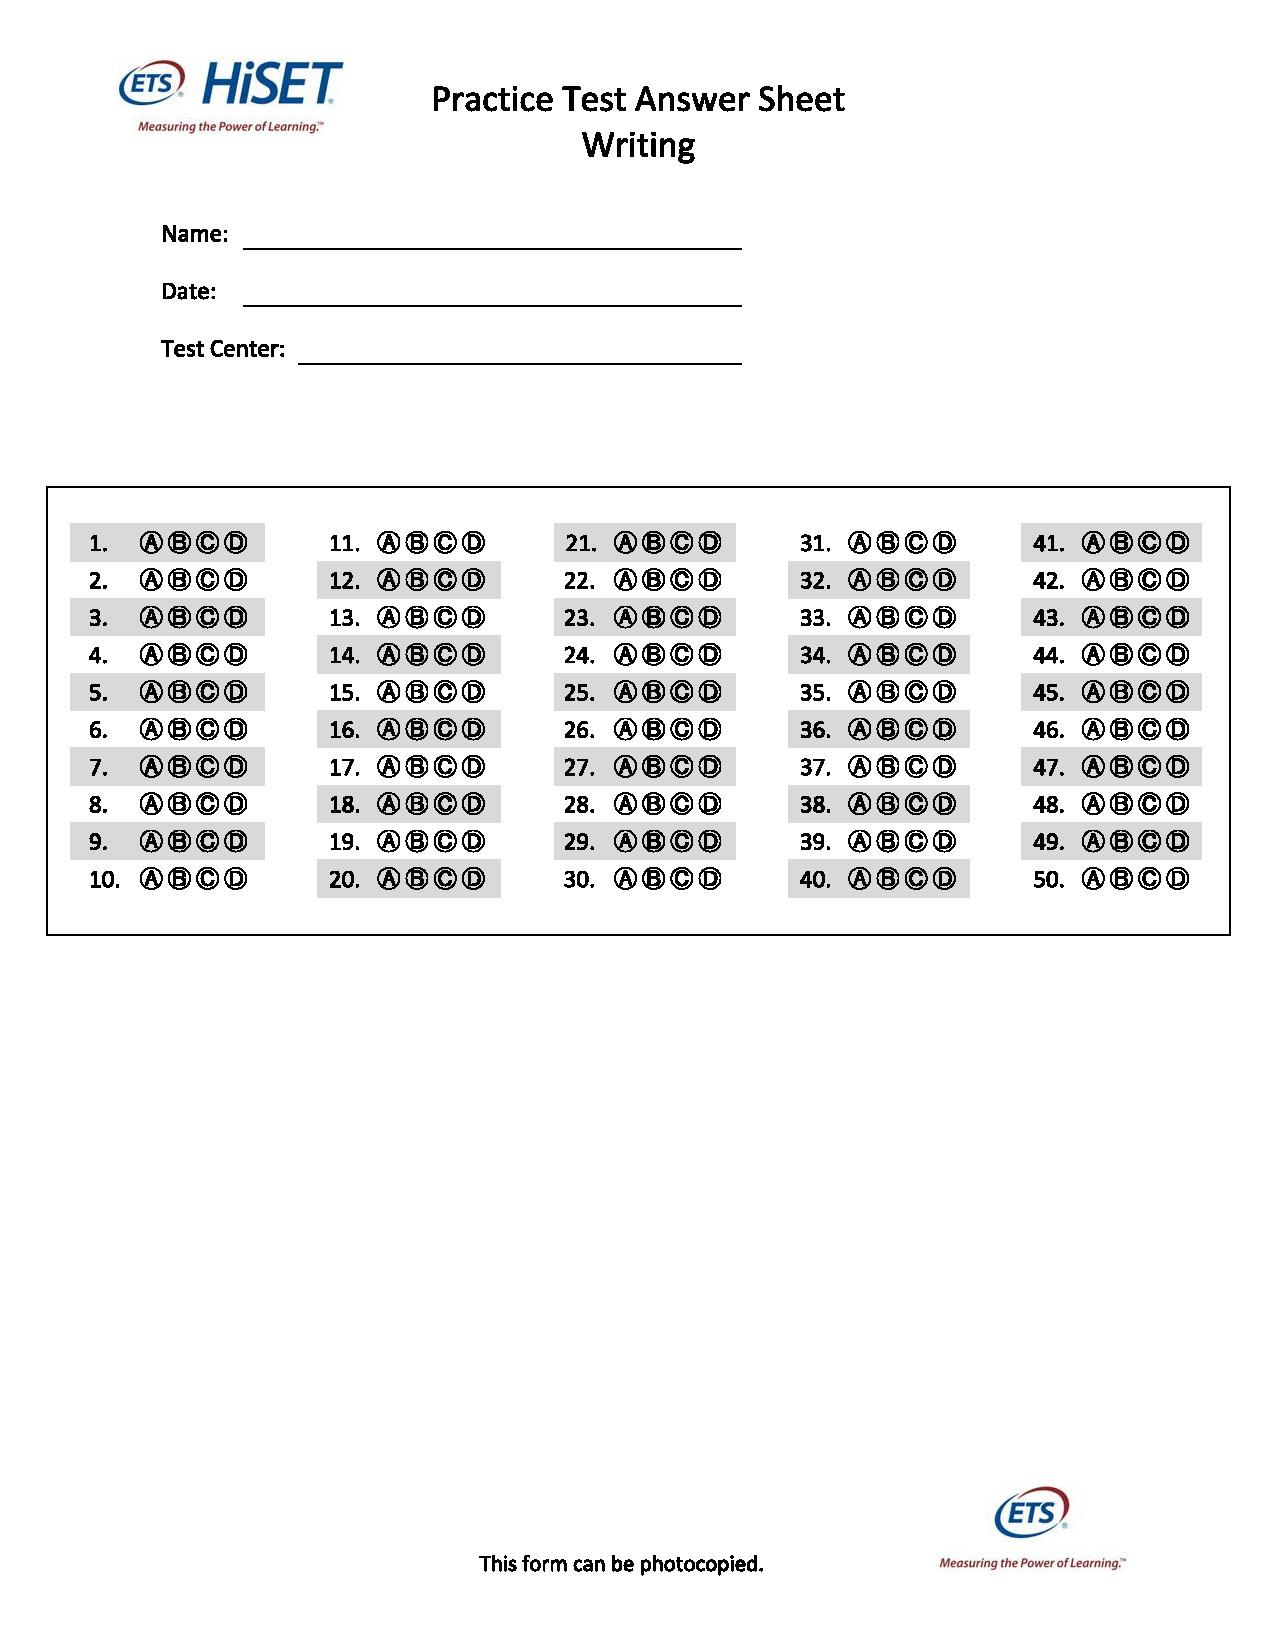 Hiset Practice Test Math Worksheets Hiset Best Free